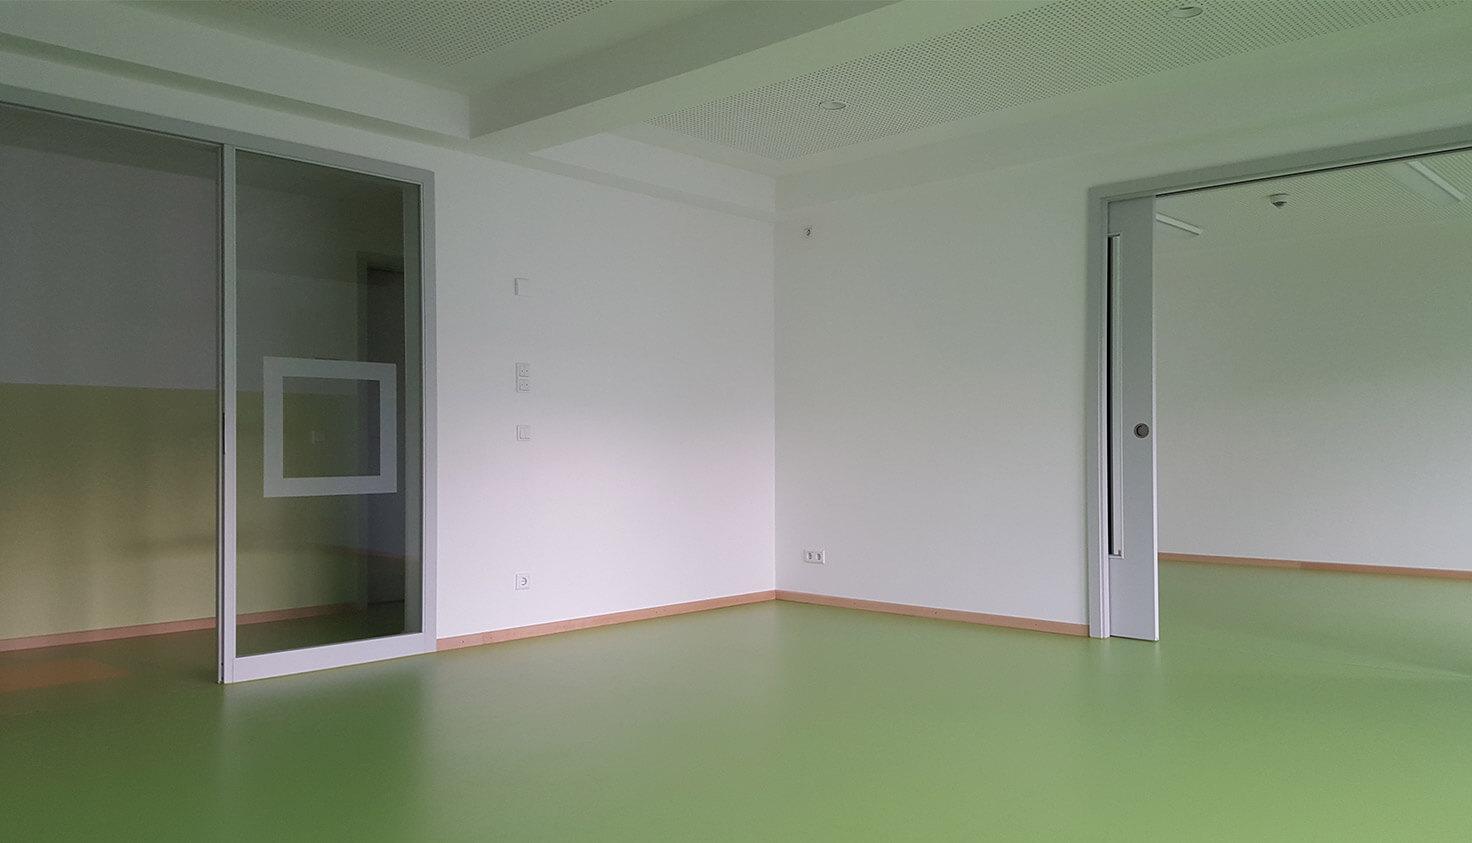 06-kita-pappelallee-referenz-malerbetrieb-kluge-berlin